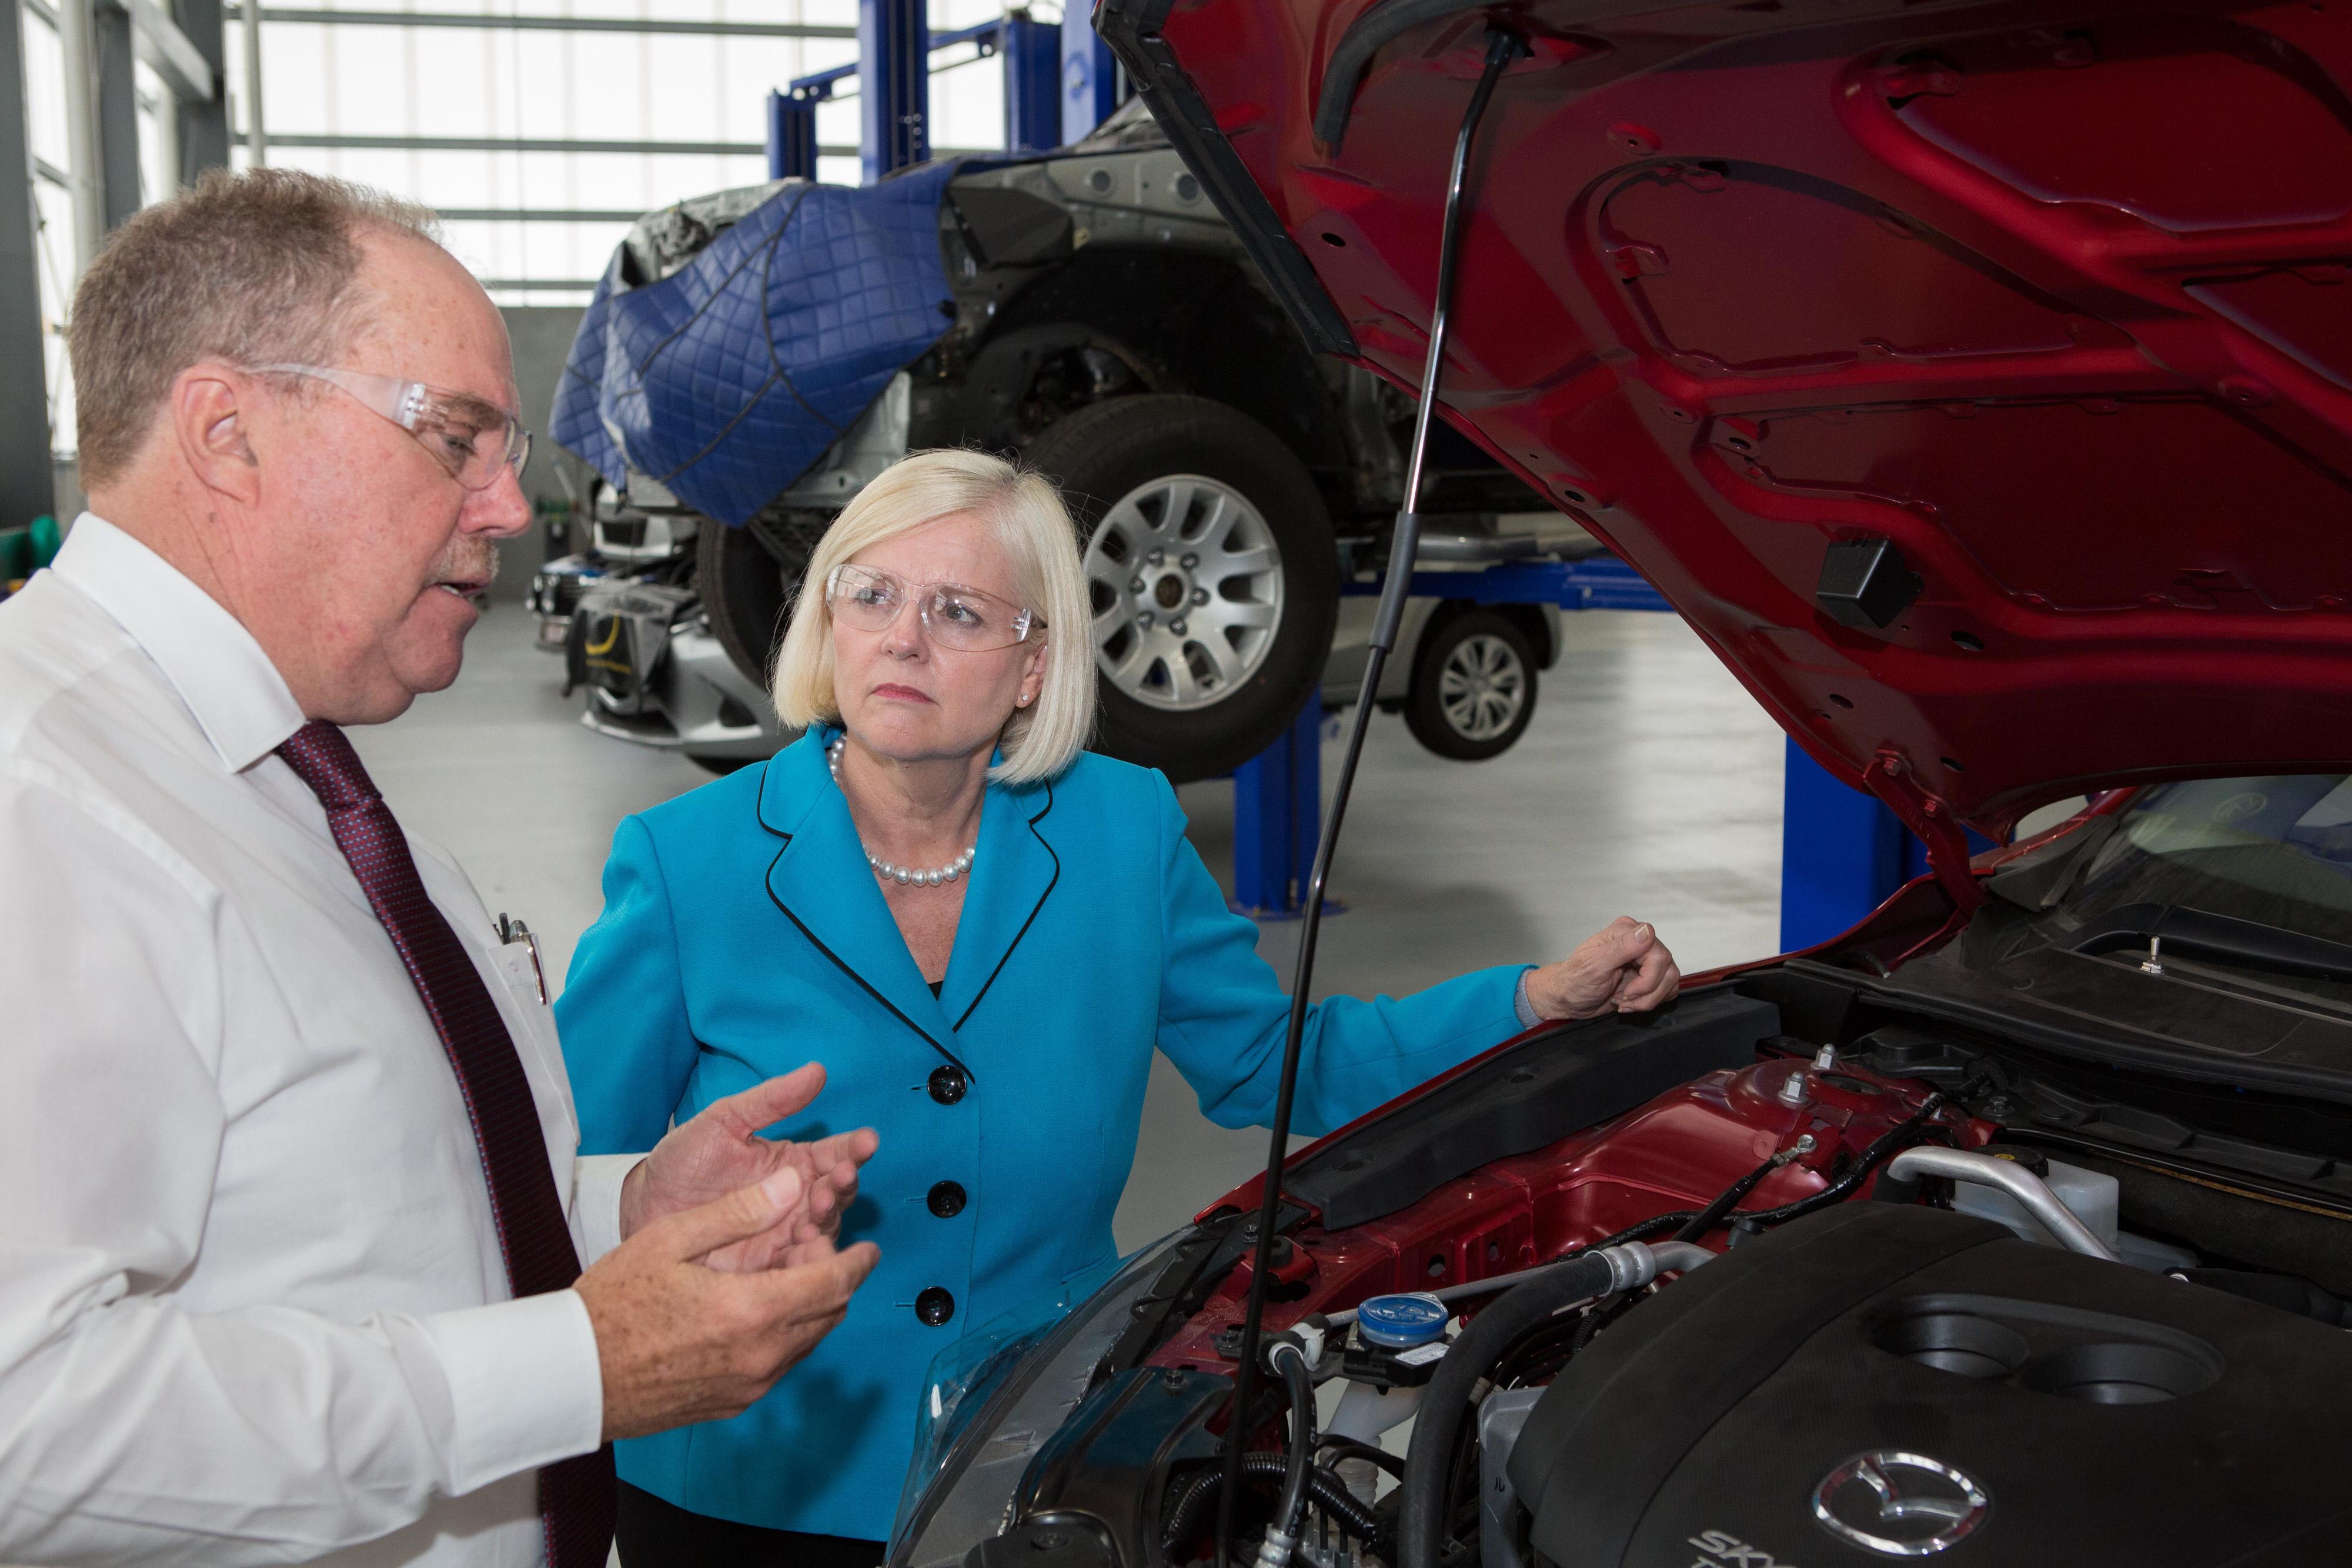 Assistant Minister for Vocational Education & Skills supports Mazda Australia's Registered Training Organisation